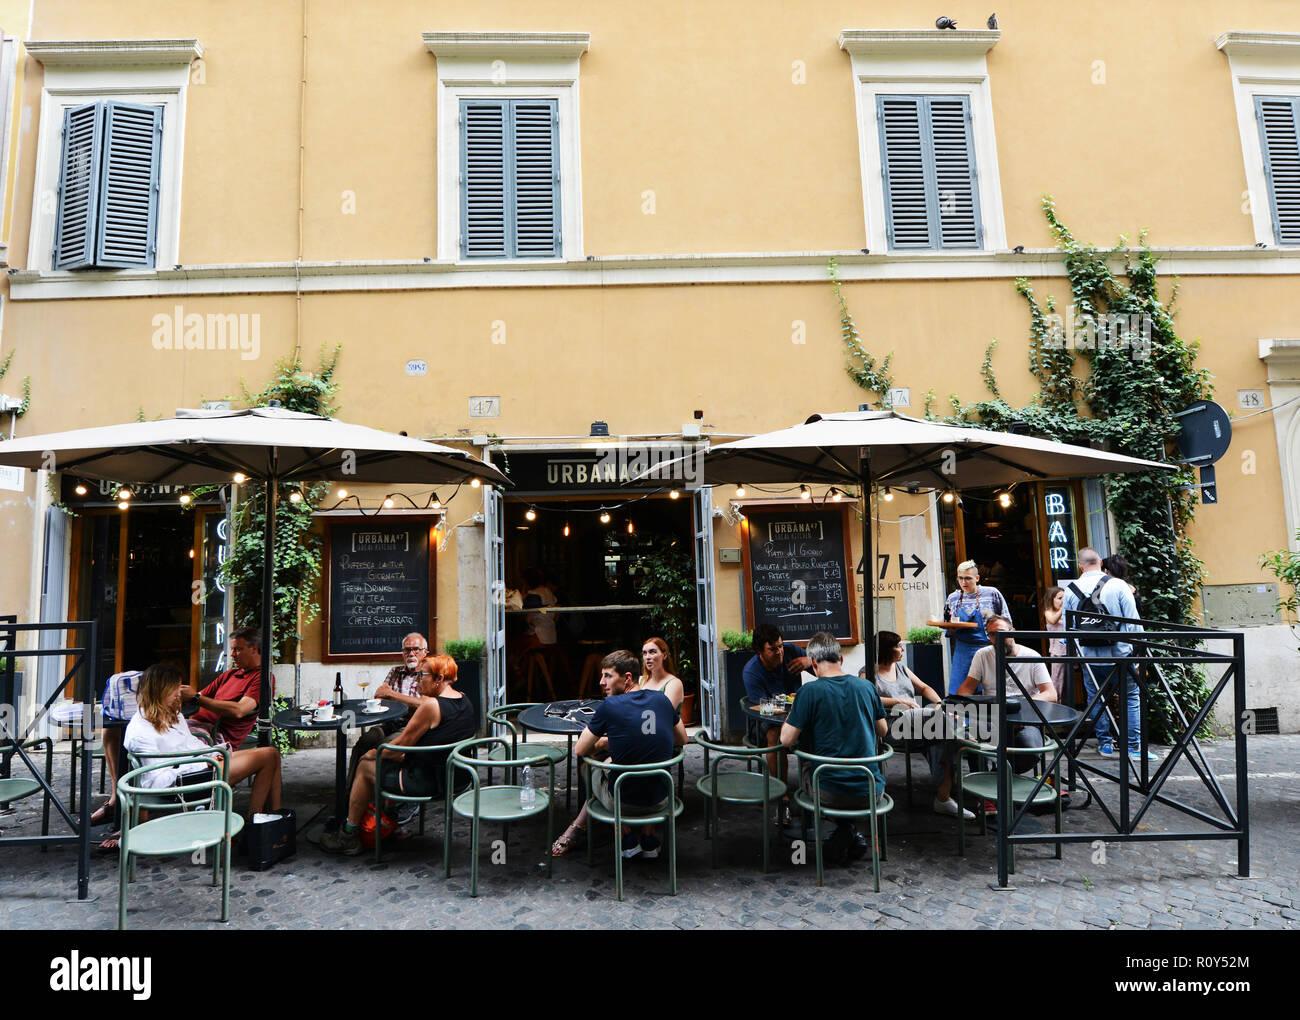 The vibrant Via Urbana in Monti, Rome. - Stock Image